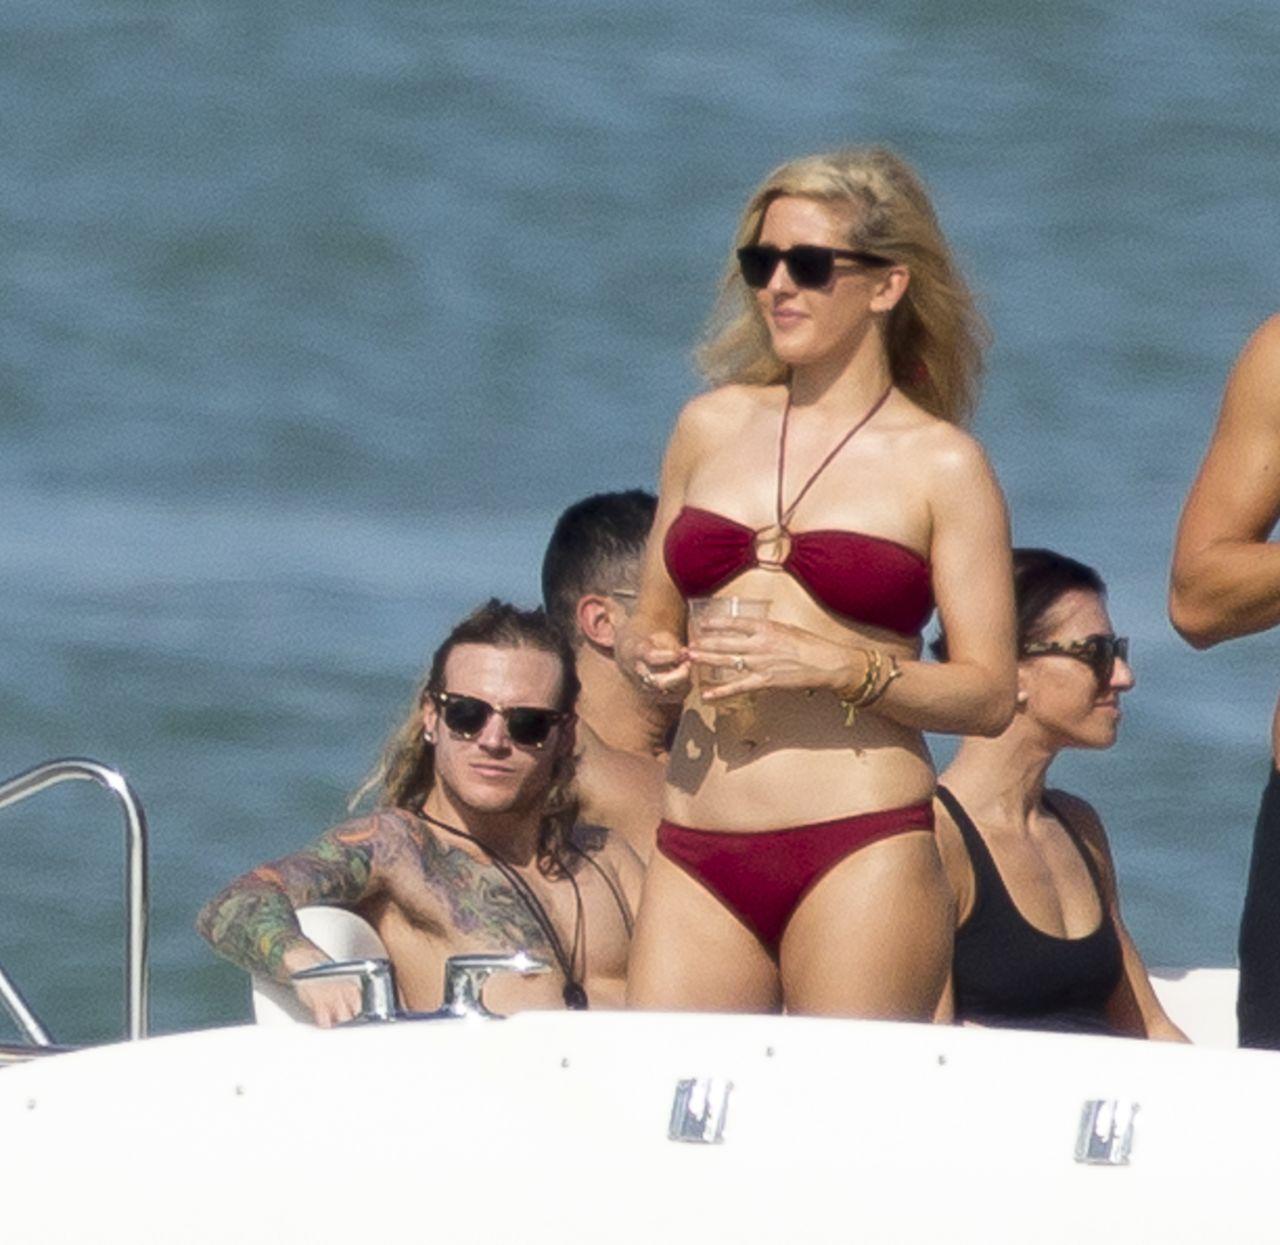 in bikini Fappening Ellie Goulding naked photo 2017